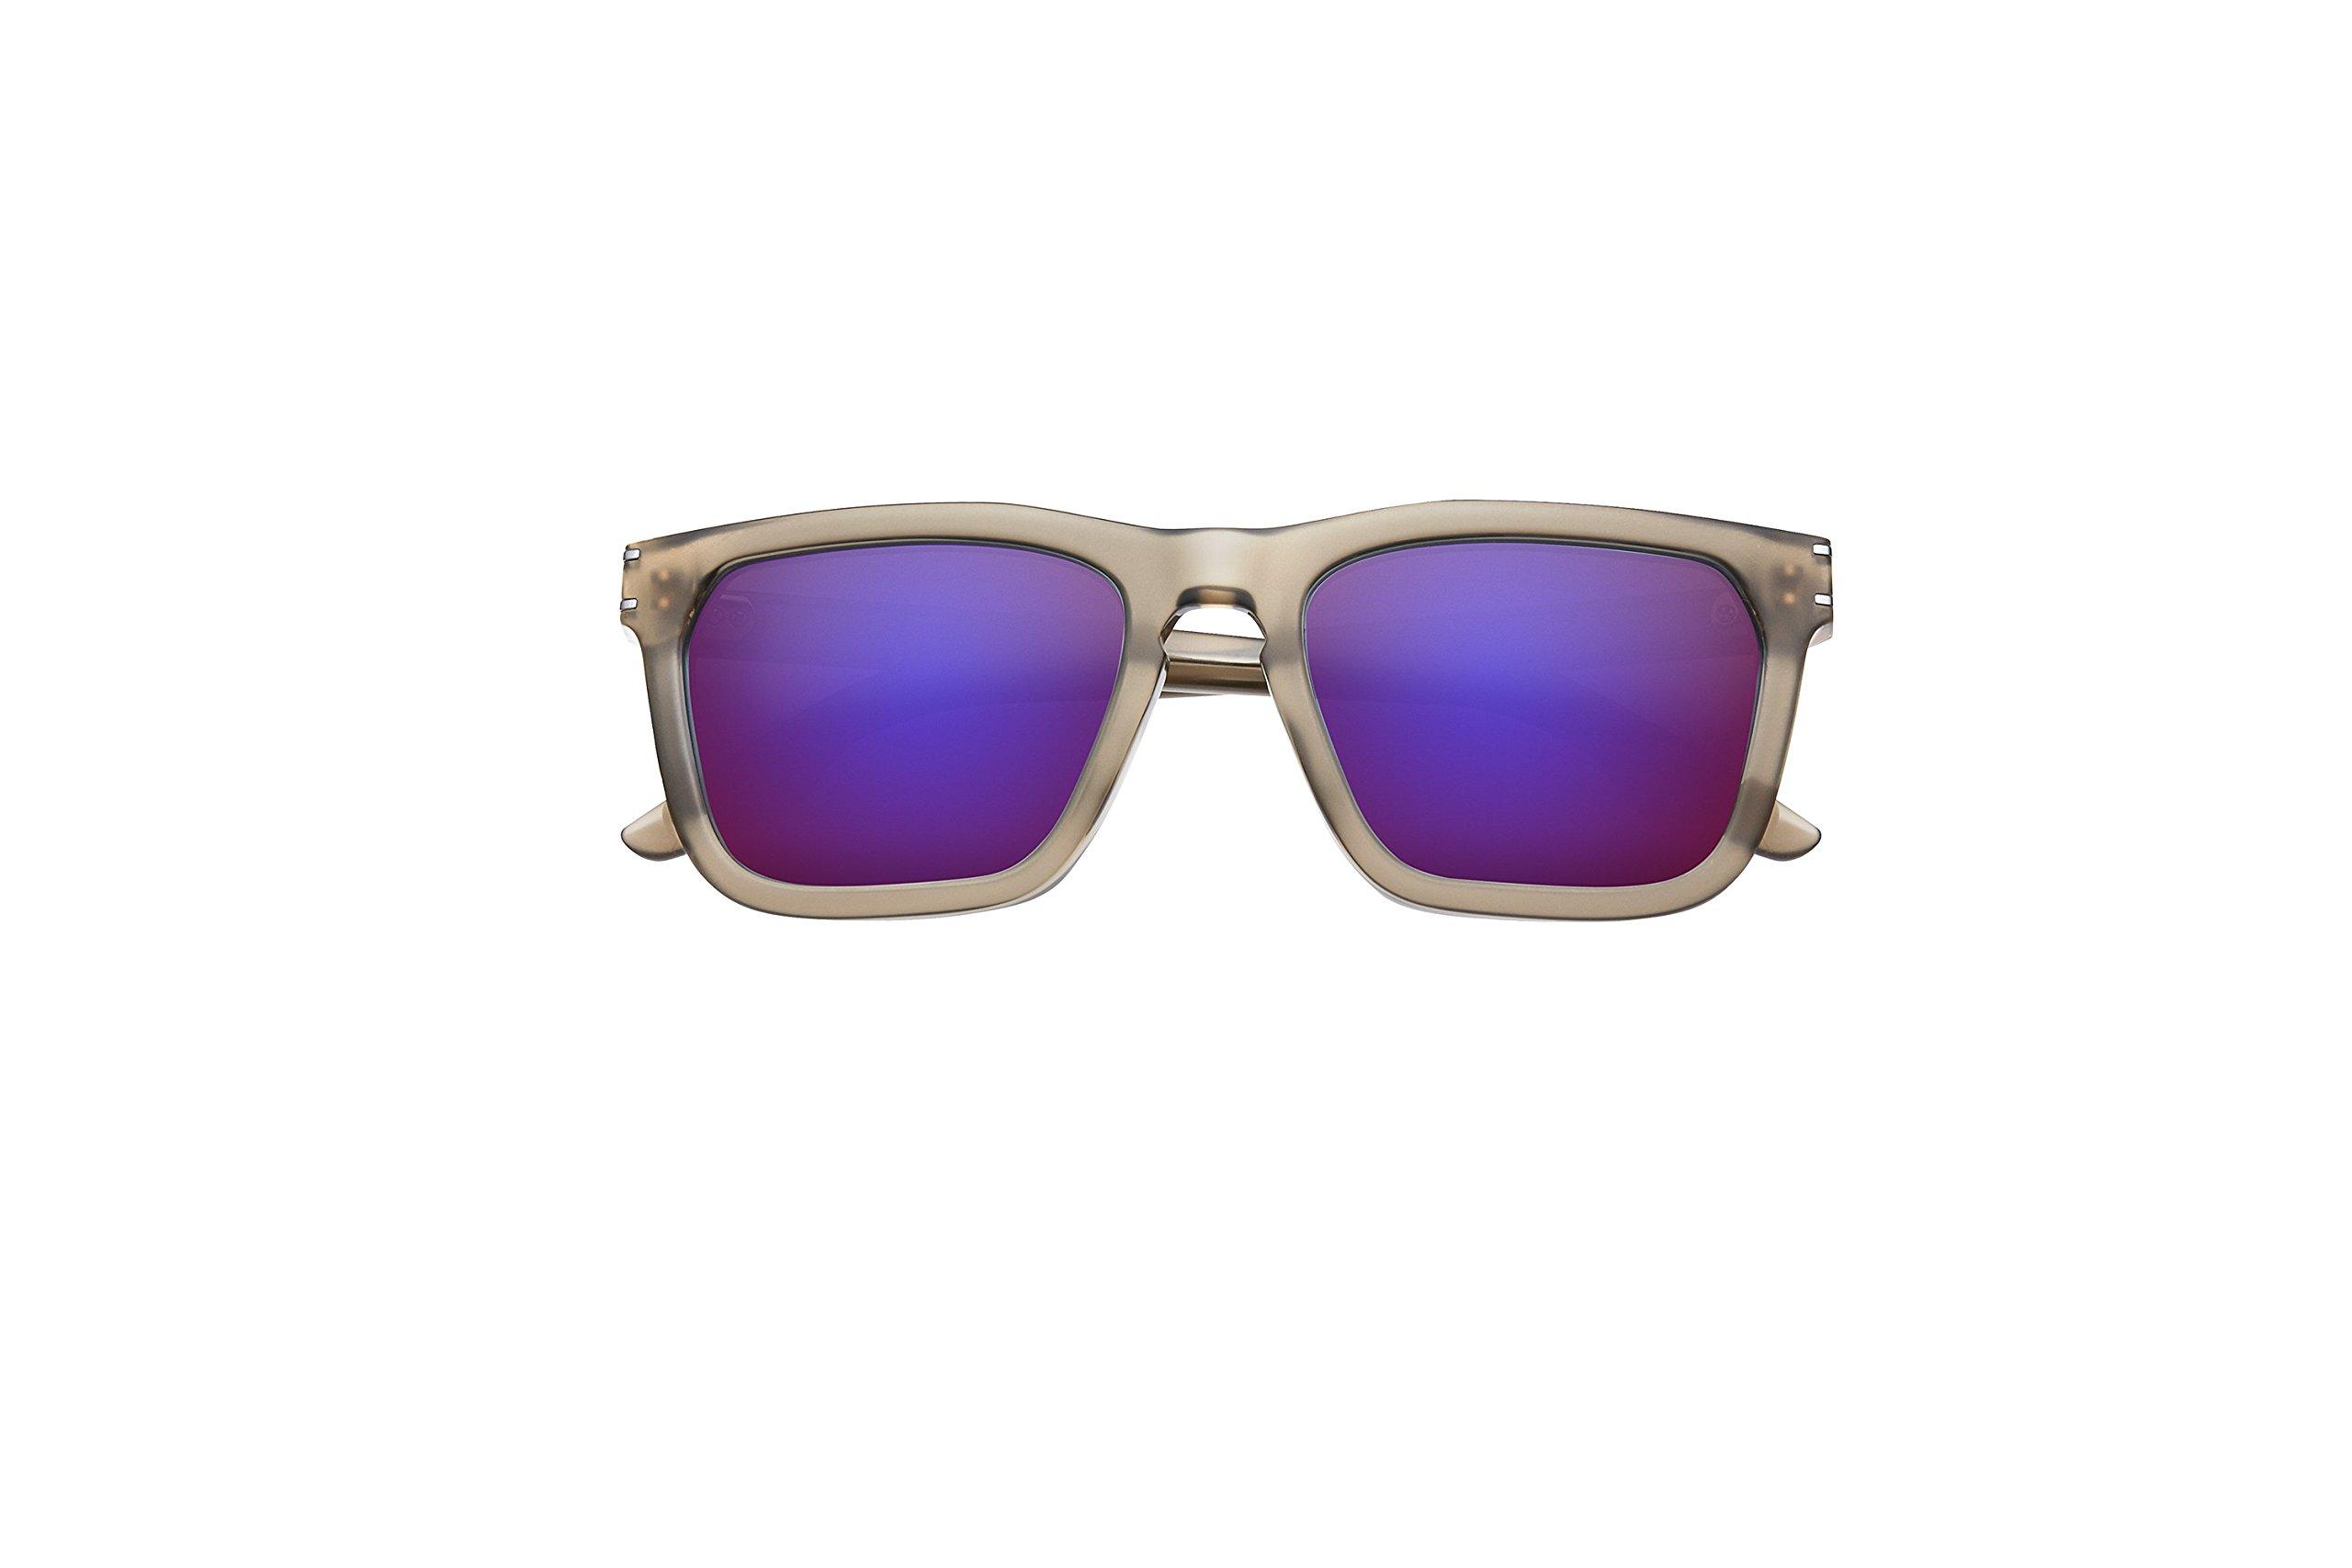 IVI Eyewear Gravitas Matte Dust and Gunmetal with AMETHYST Framed Sunglasses